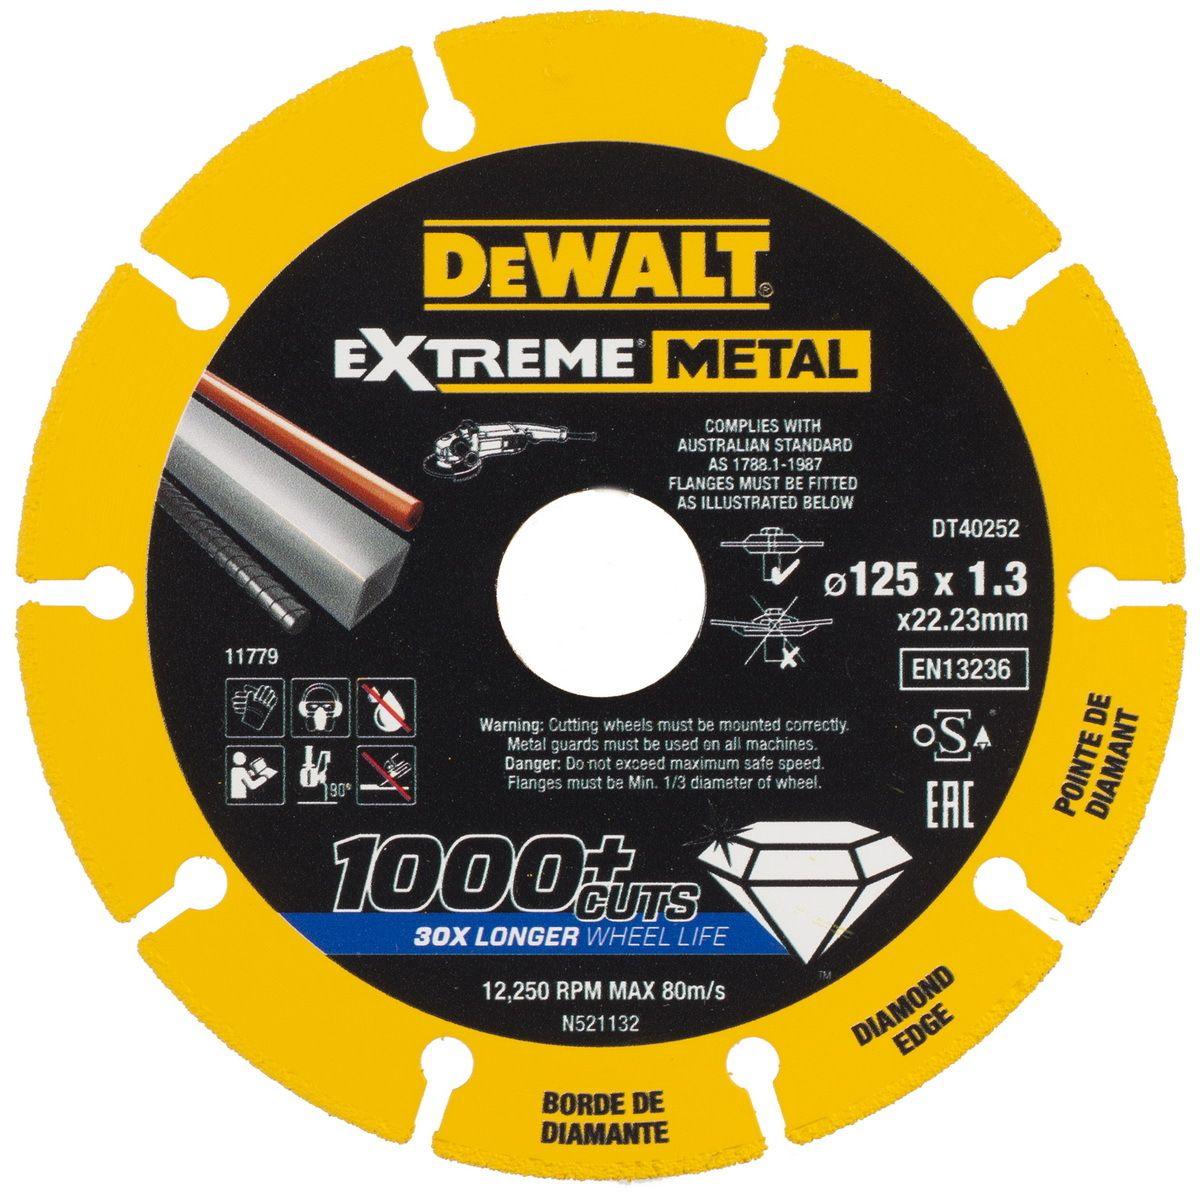 Řezný diamantový kotouč 125mm, EXTREME METAL DEWALT